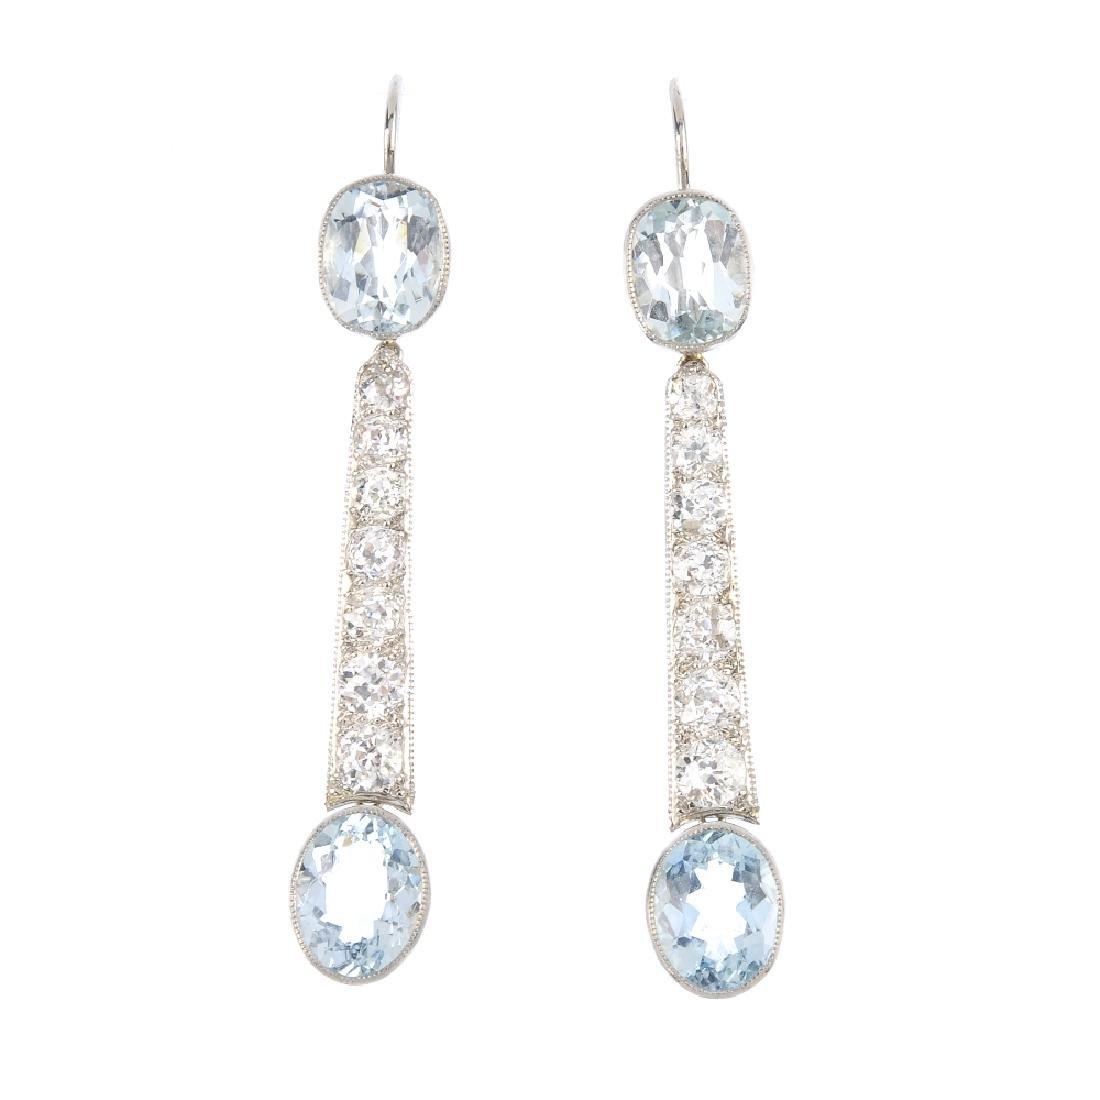 A pair of aquamarine and diamond earrings. Each